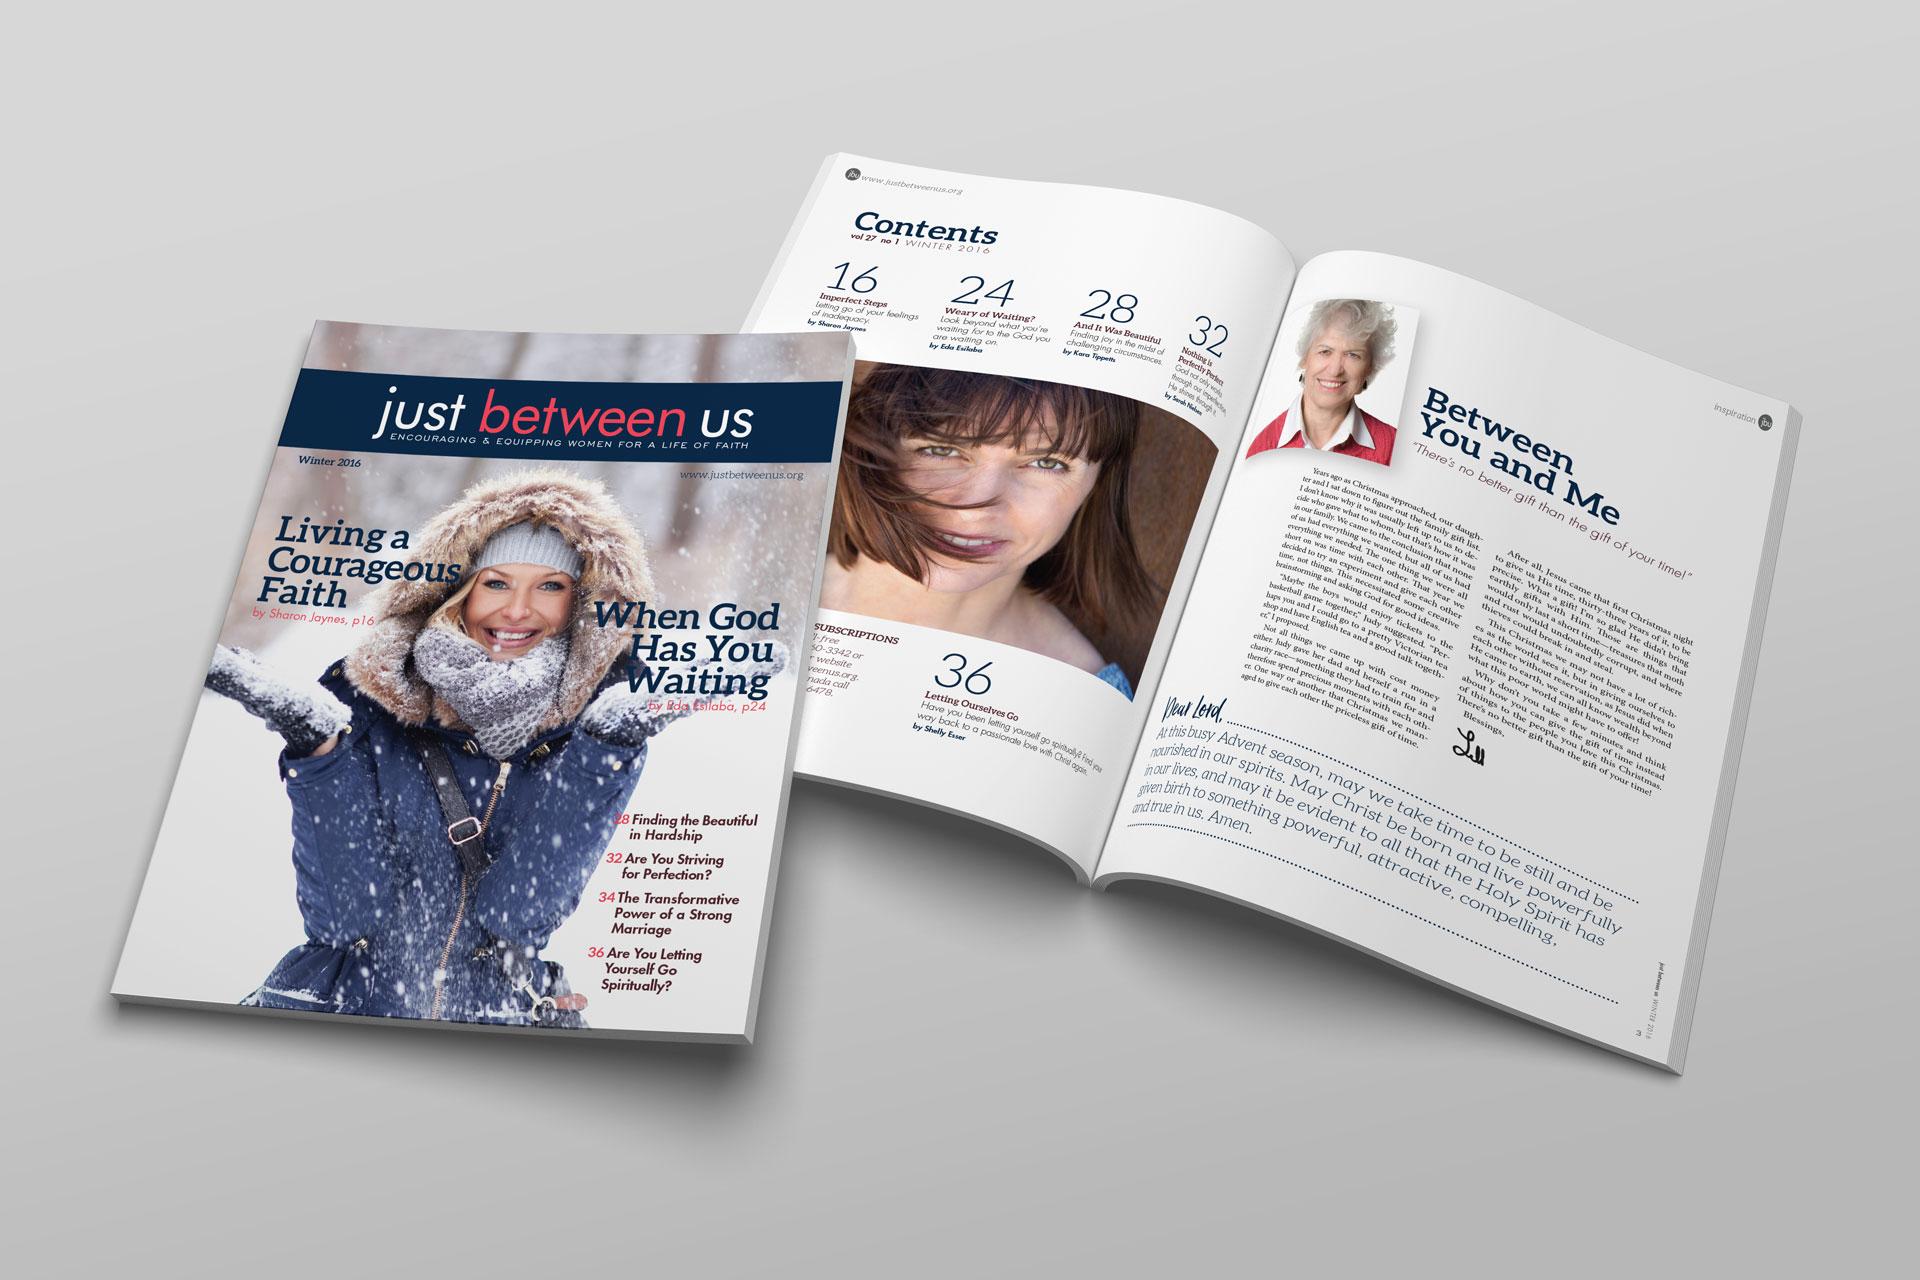 JBU-winter16-cover.jpg